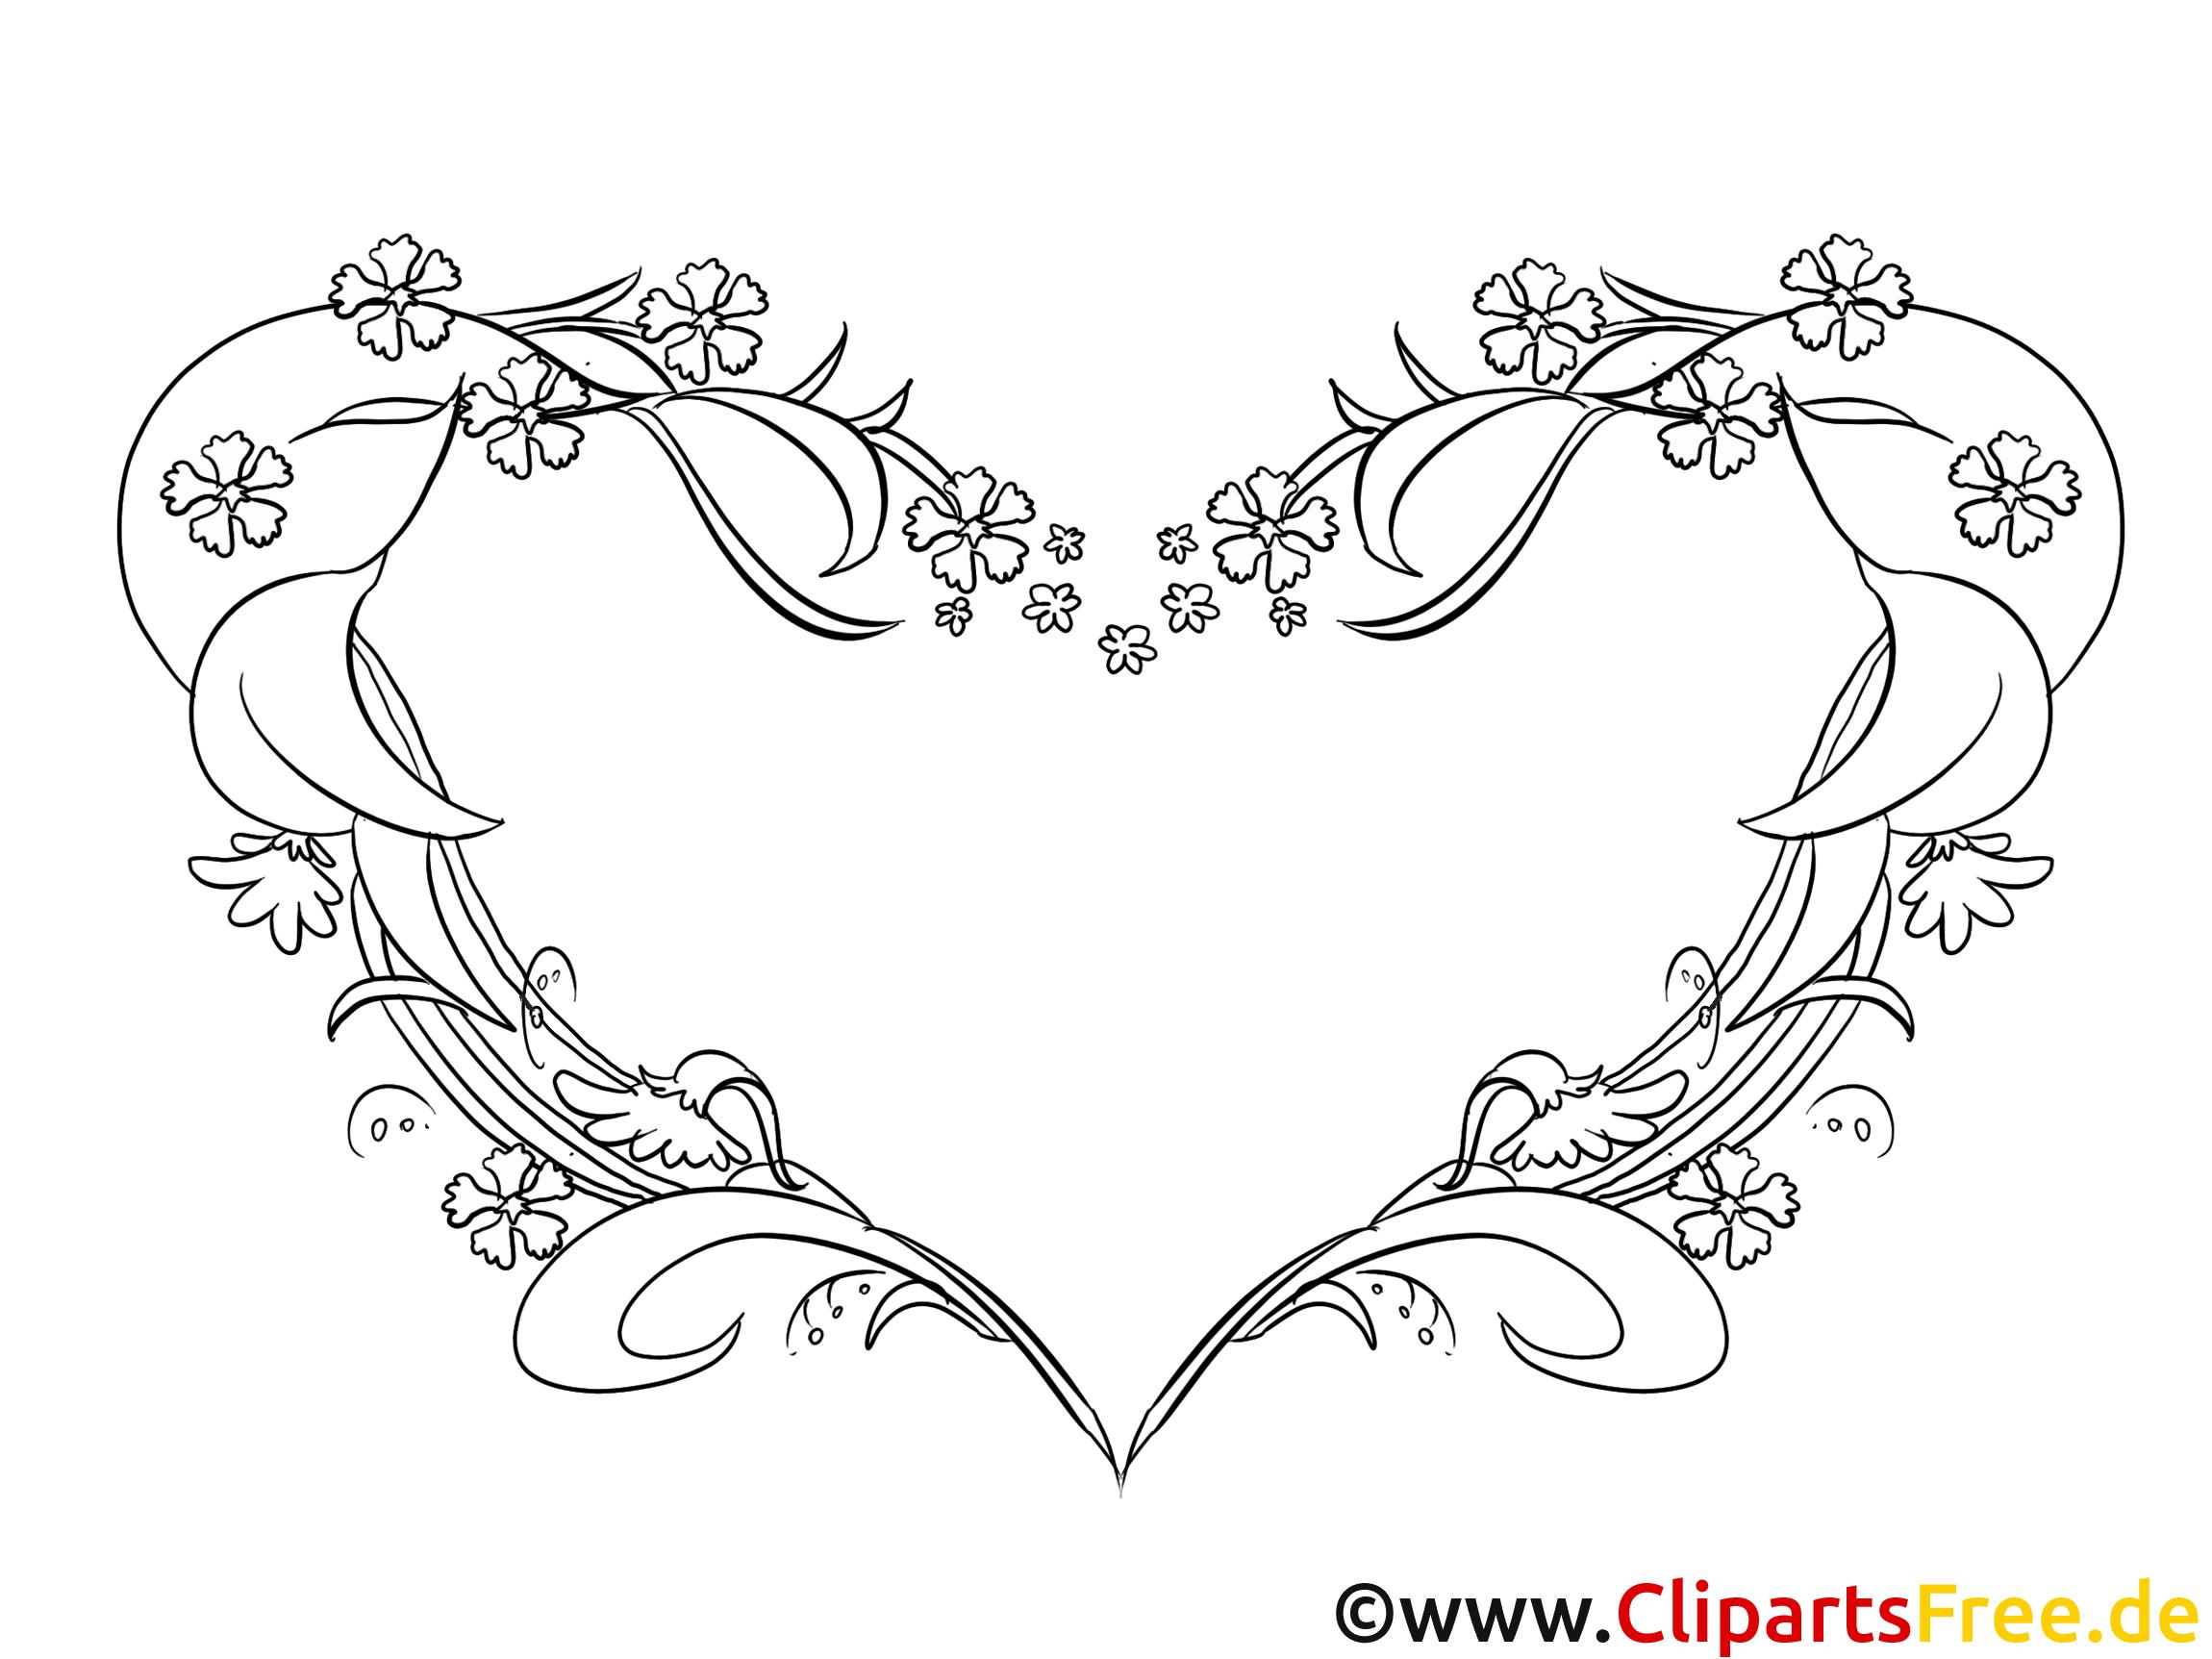 Coloriage coeur mariage gratuit - Image de coeur gratuit ...